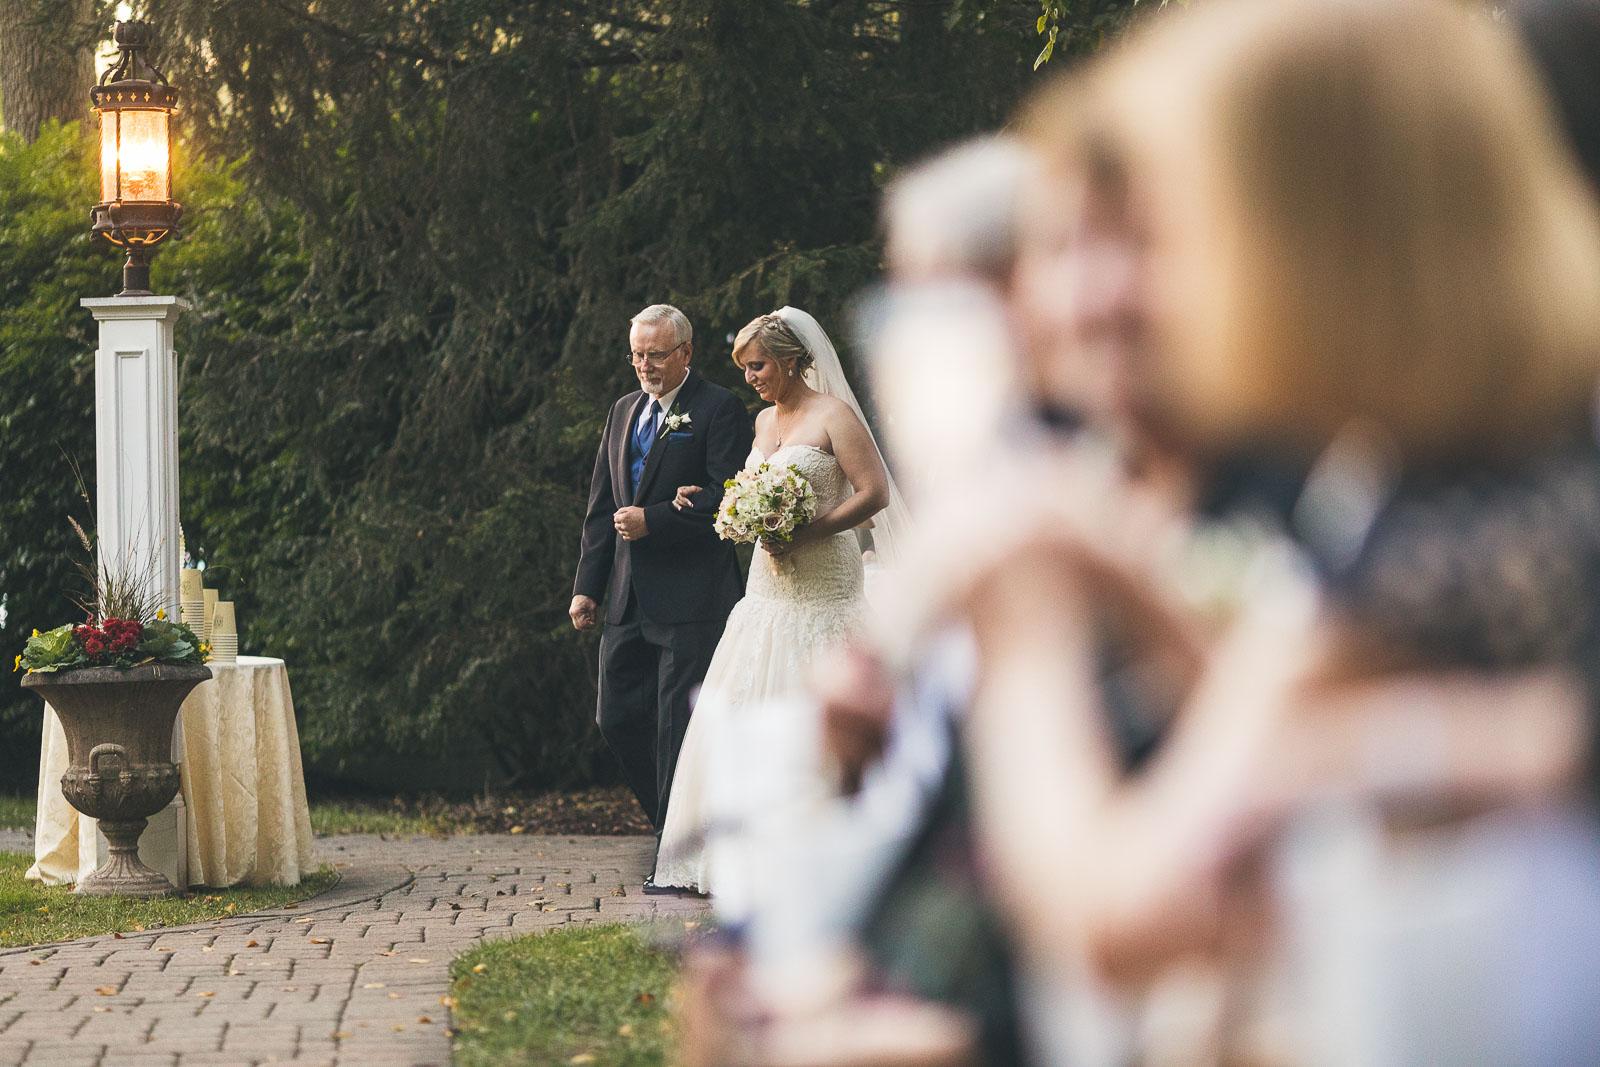 Father Walks Bride Down the Aisle